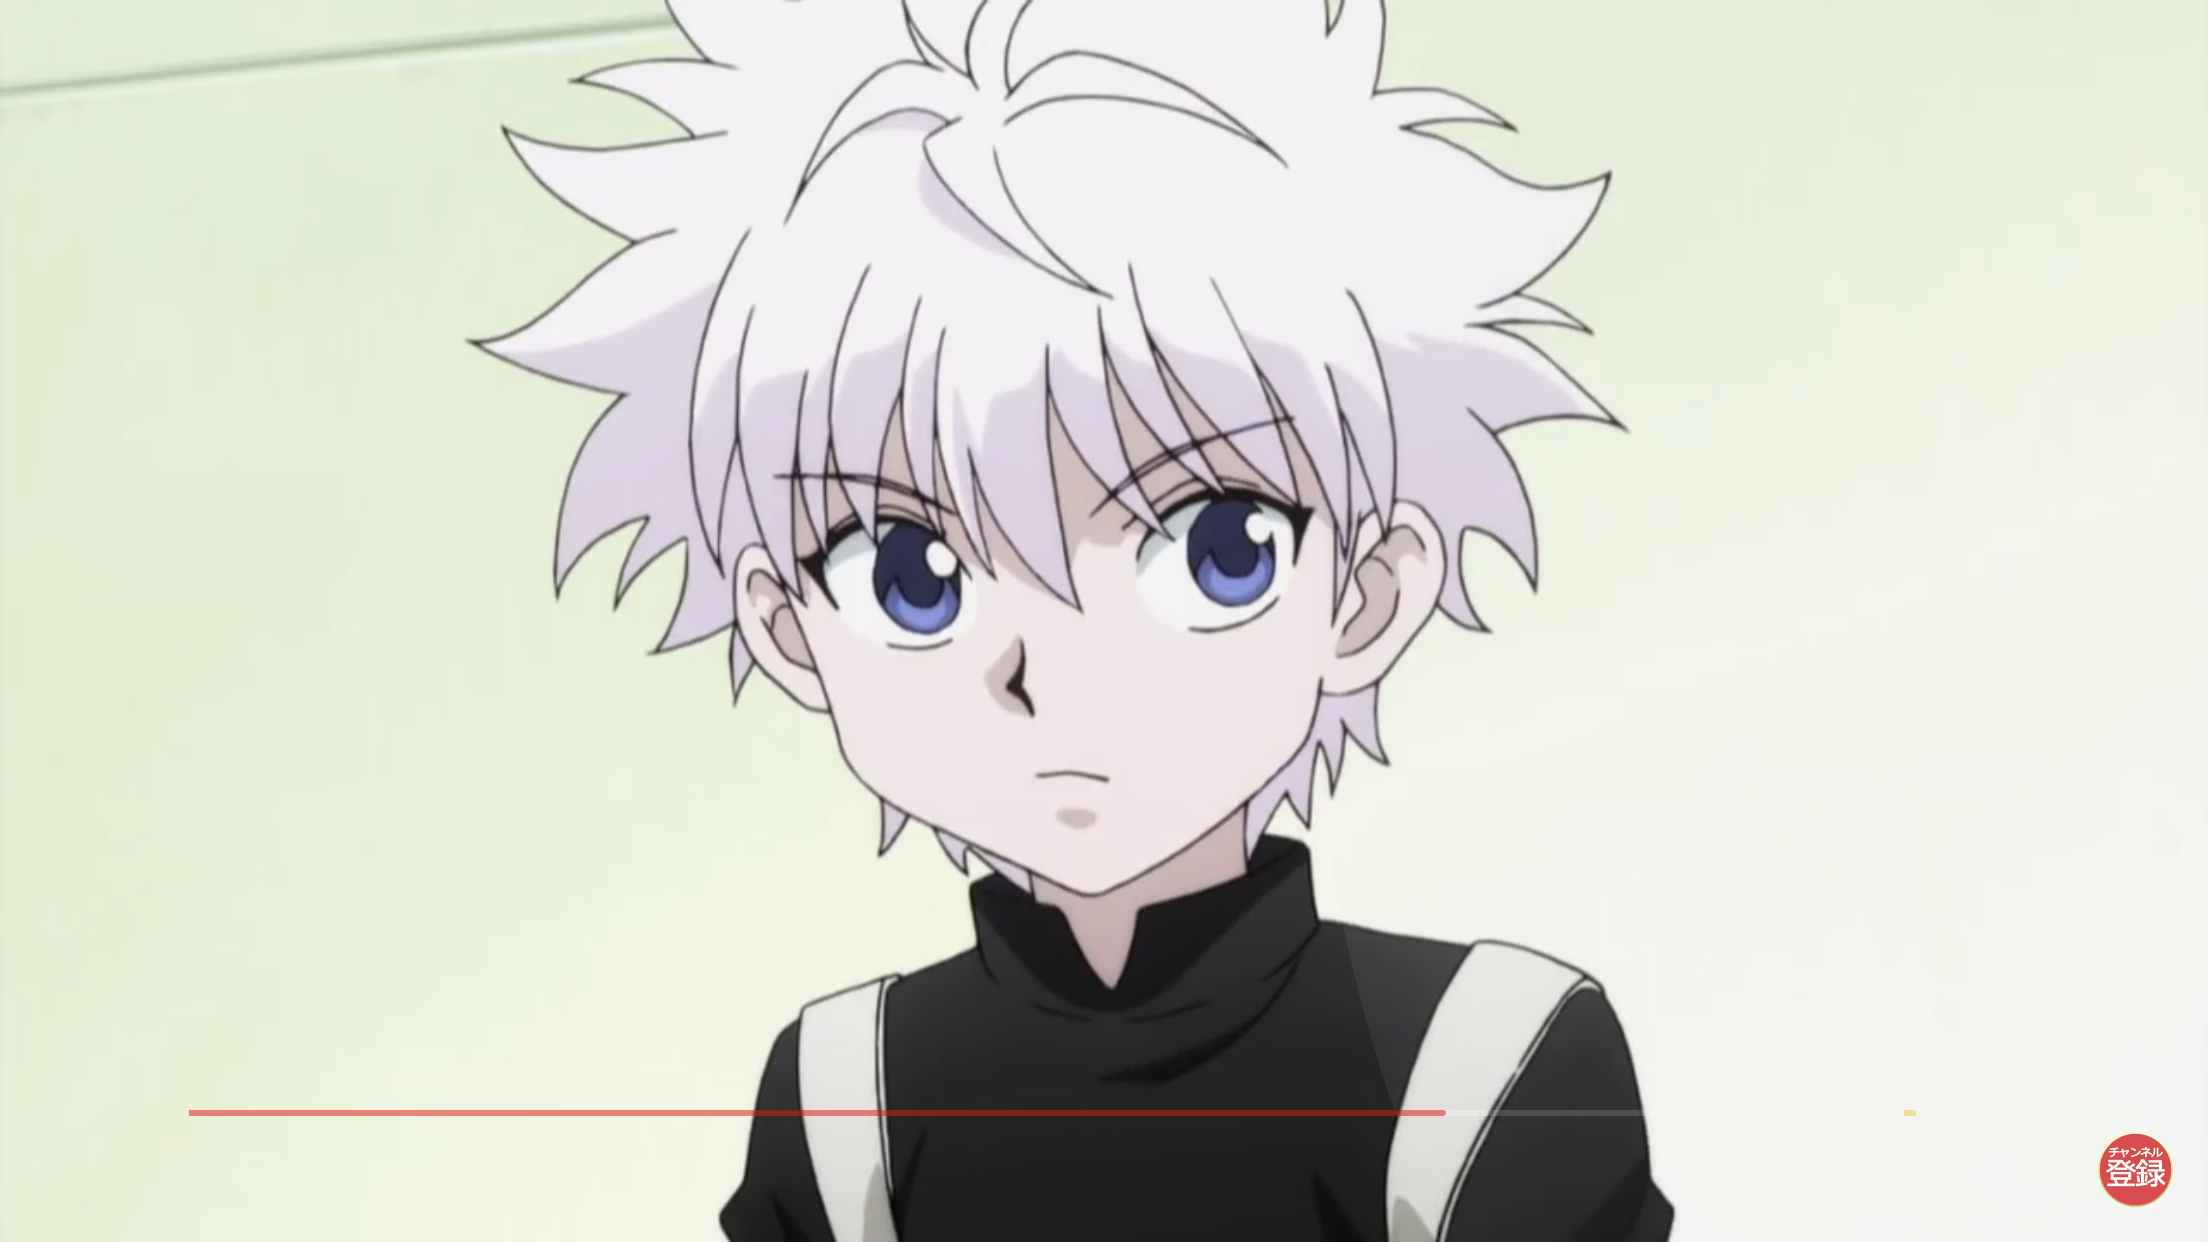 Pin by Nradila26 on Anime Anime, Hunter x hunter